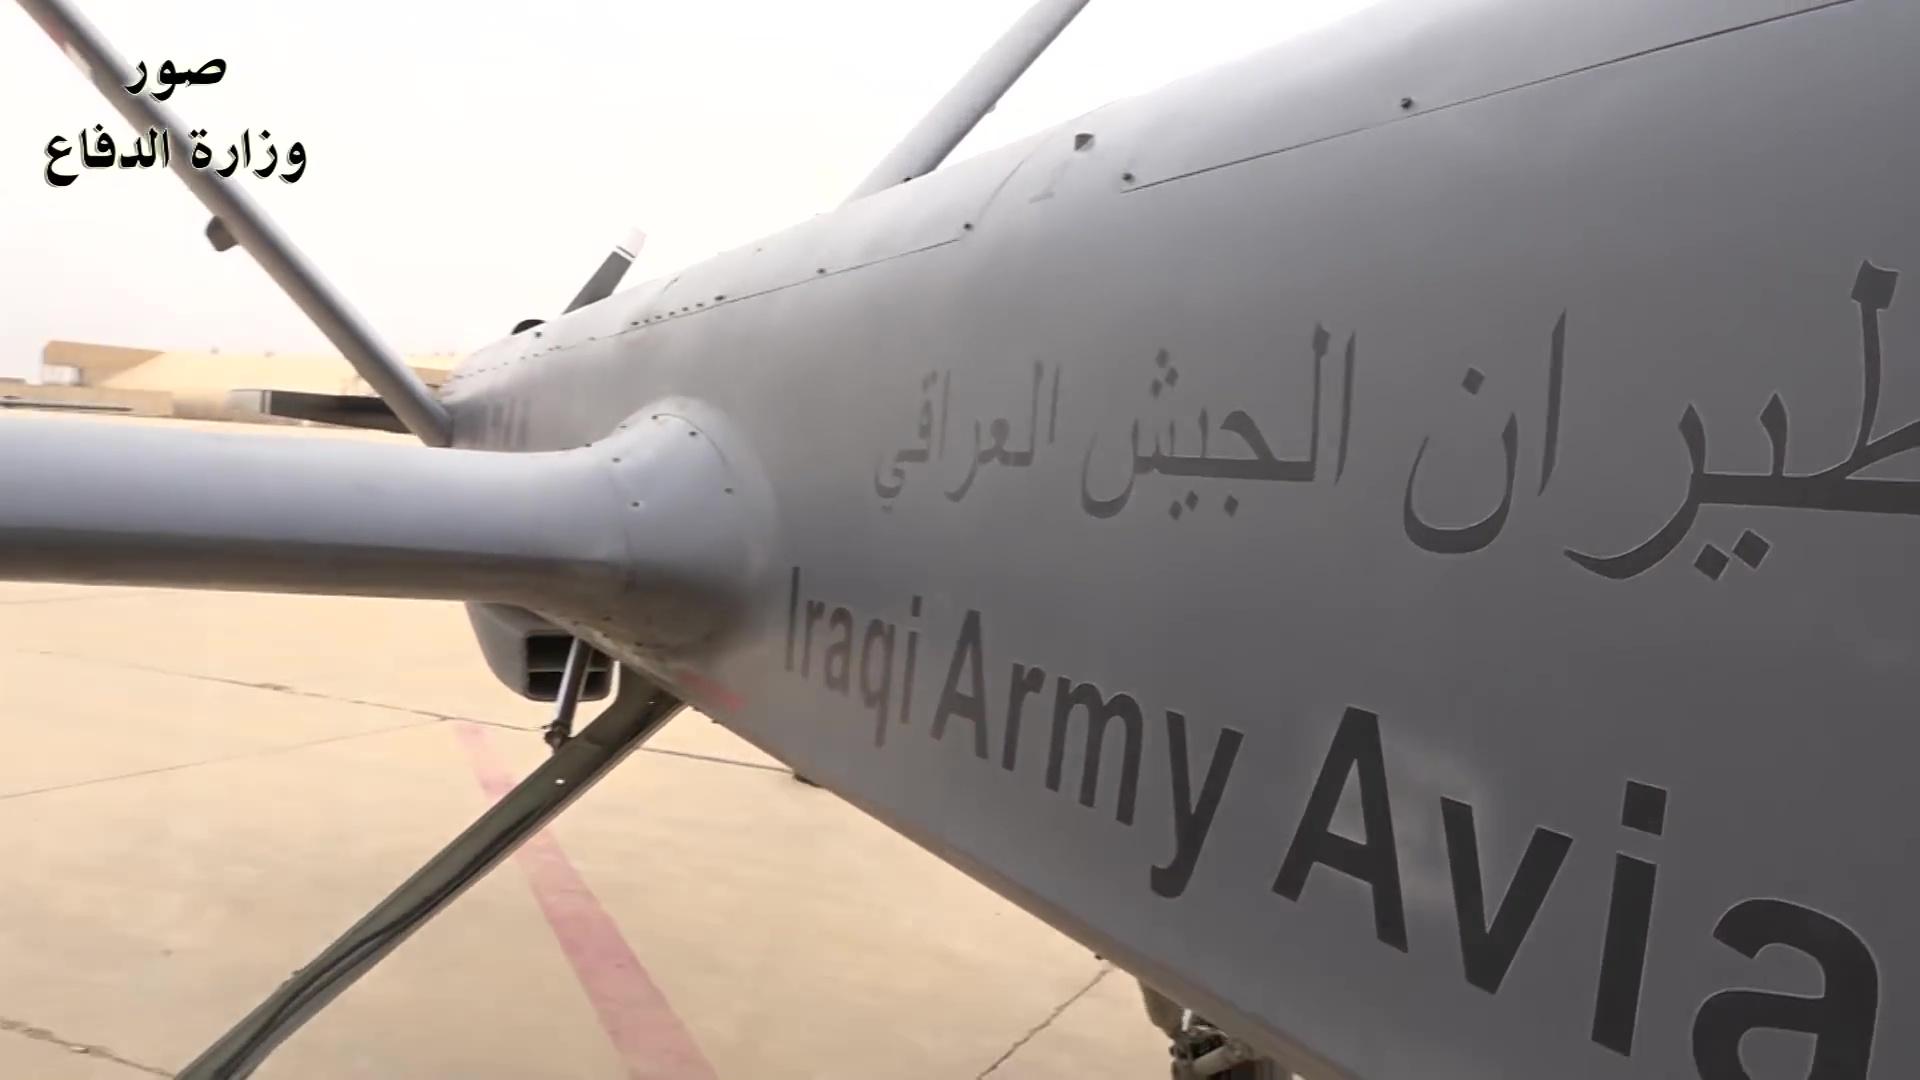 مسابقة رمضان الطائرات دون طيار  2018-02-18-Les-officiers-irakiens-parlent-du-drone-CH-4-04